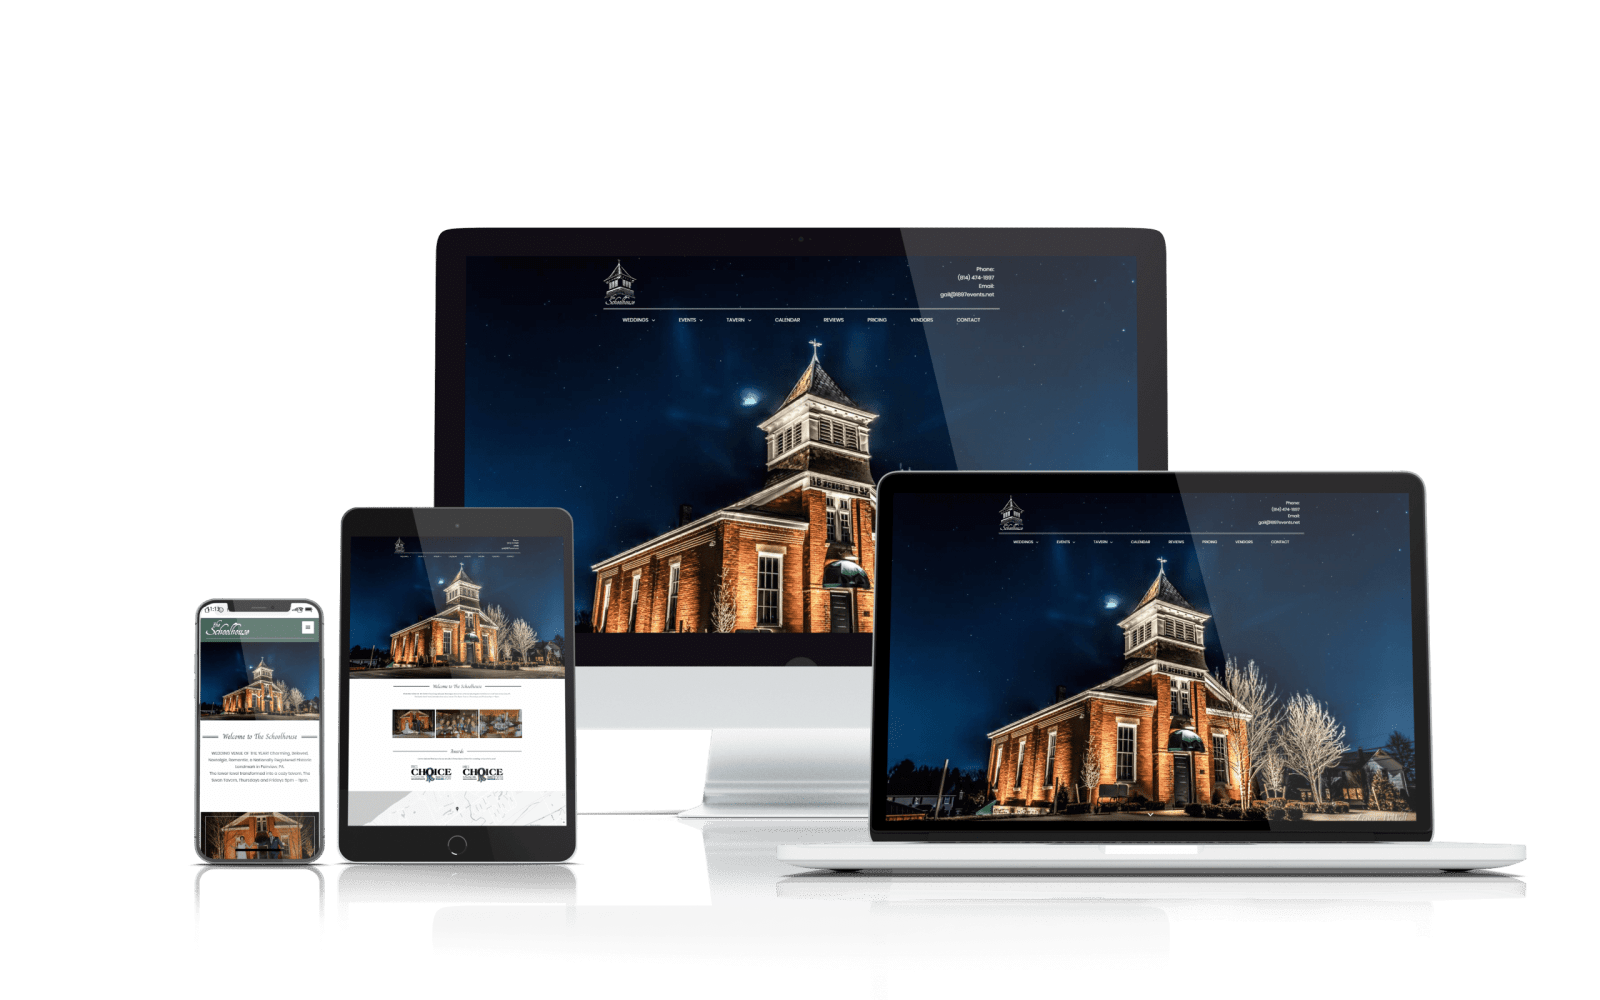 event venue web design